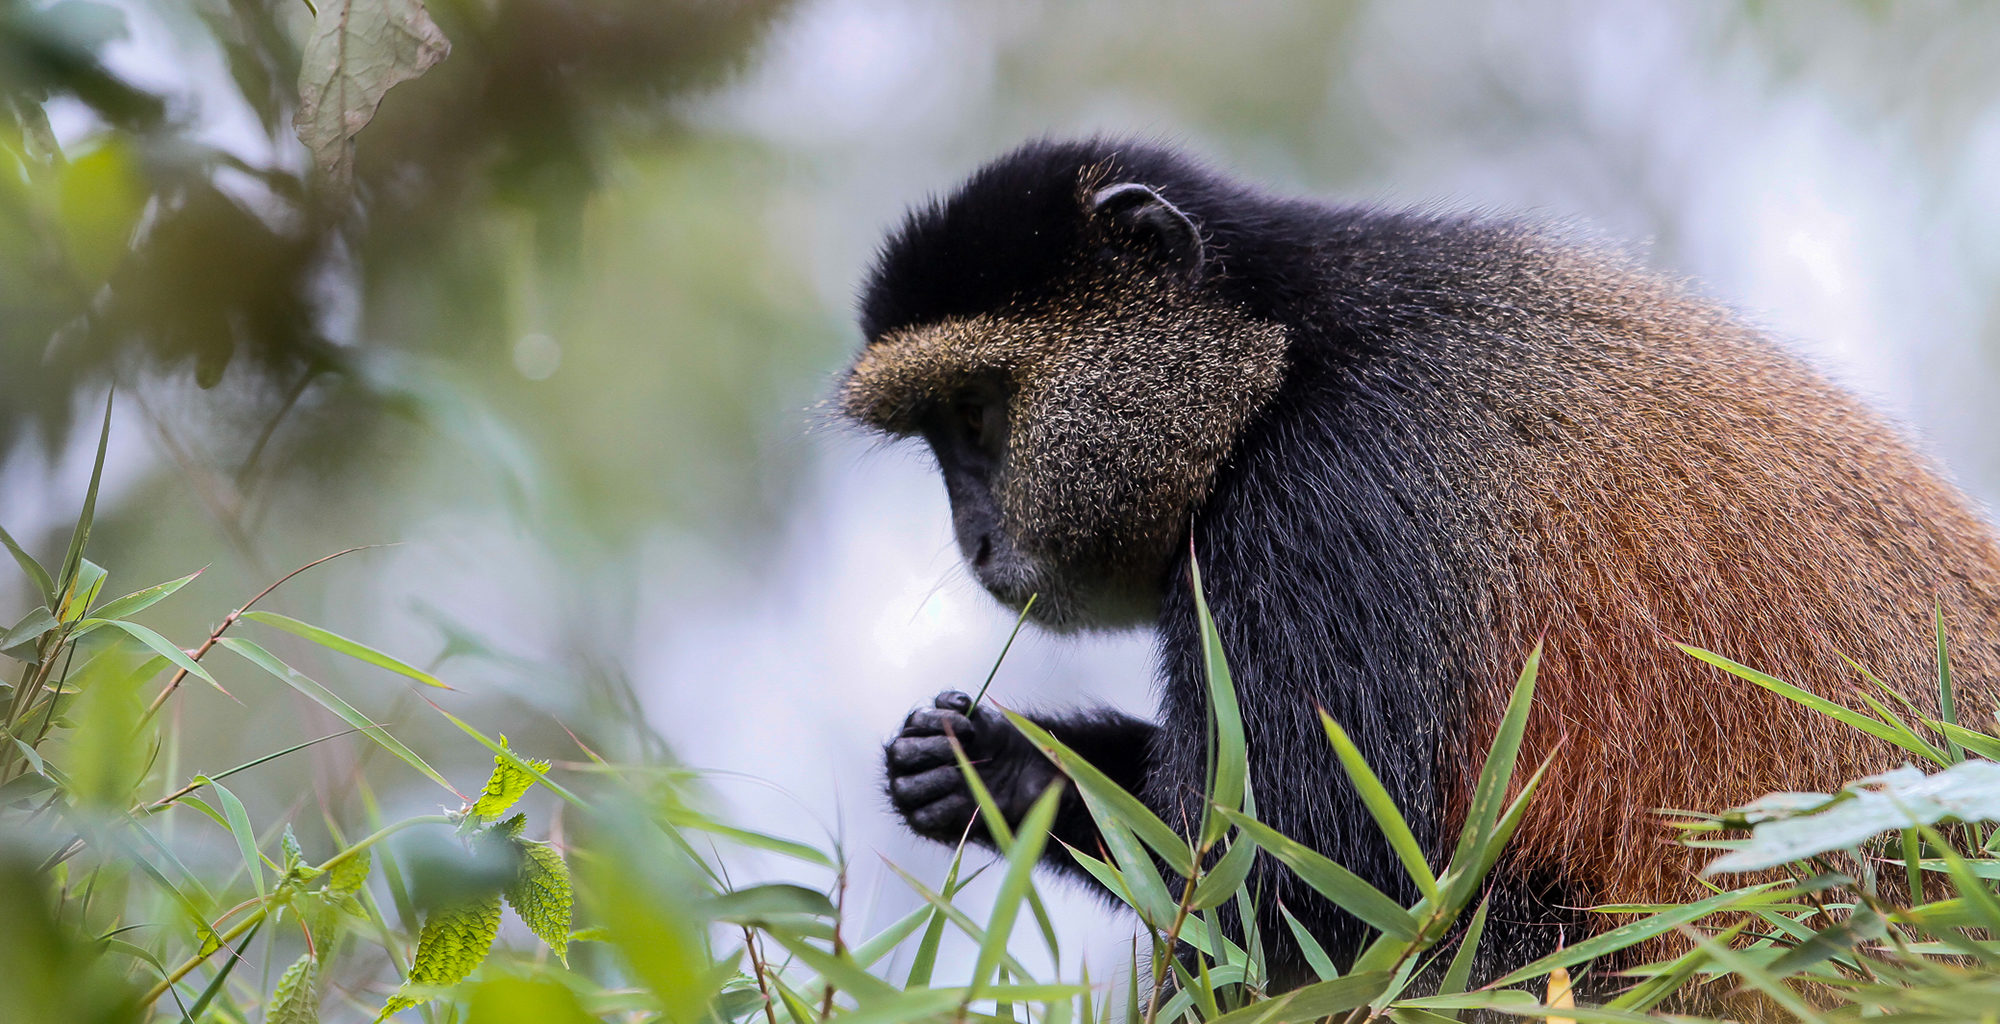 Rwanda-Volcanoes-National-Park-Wildlife